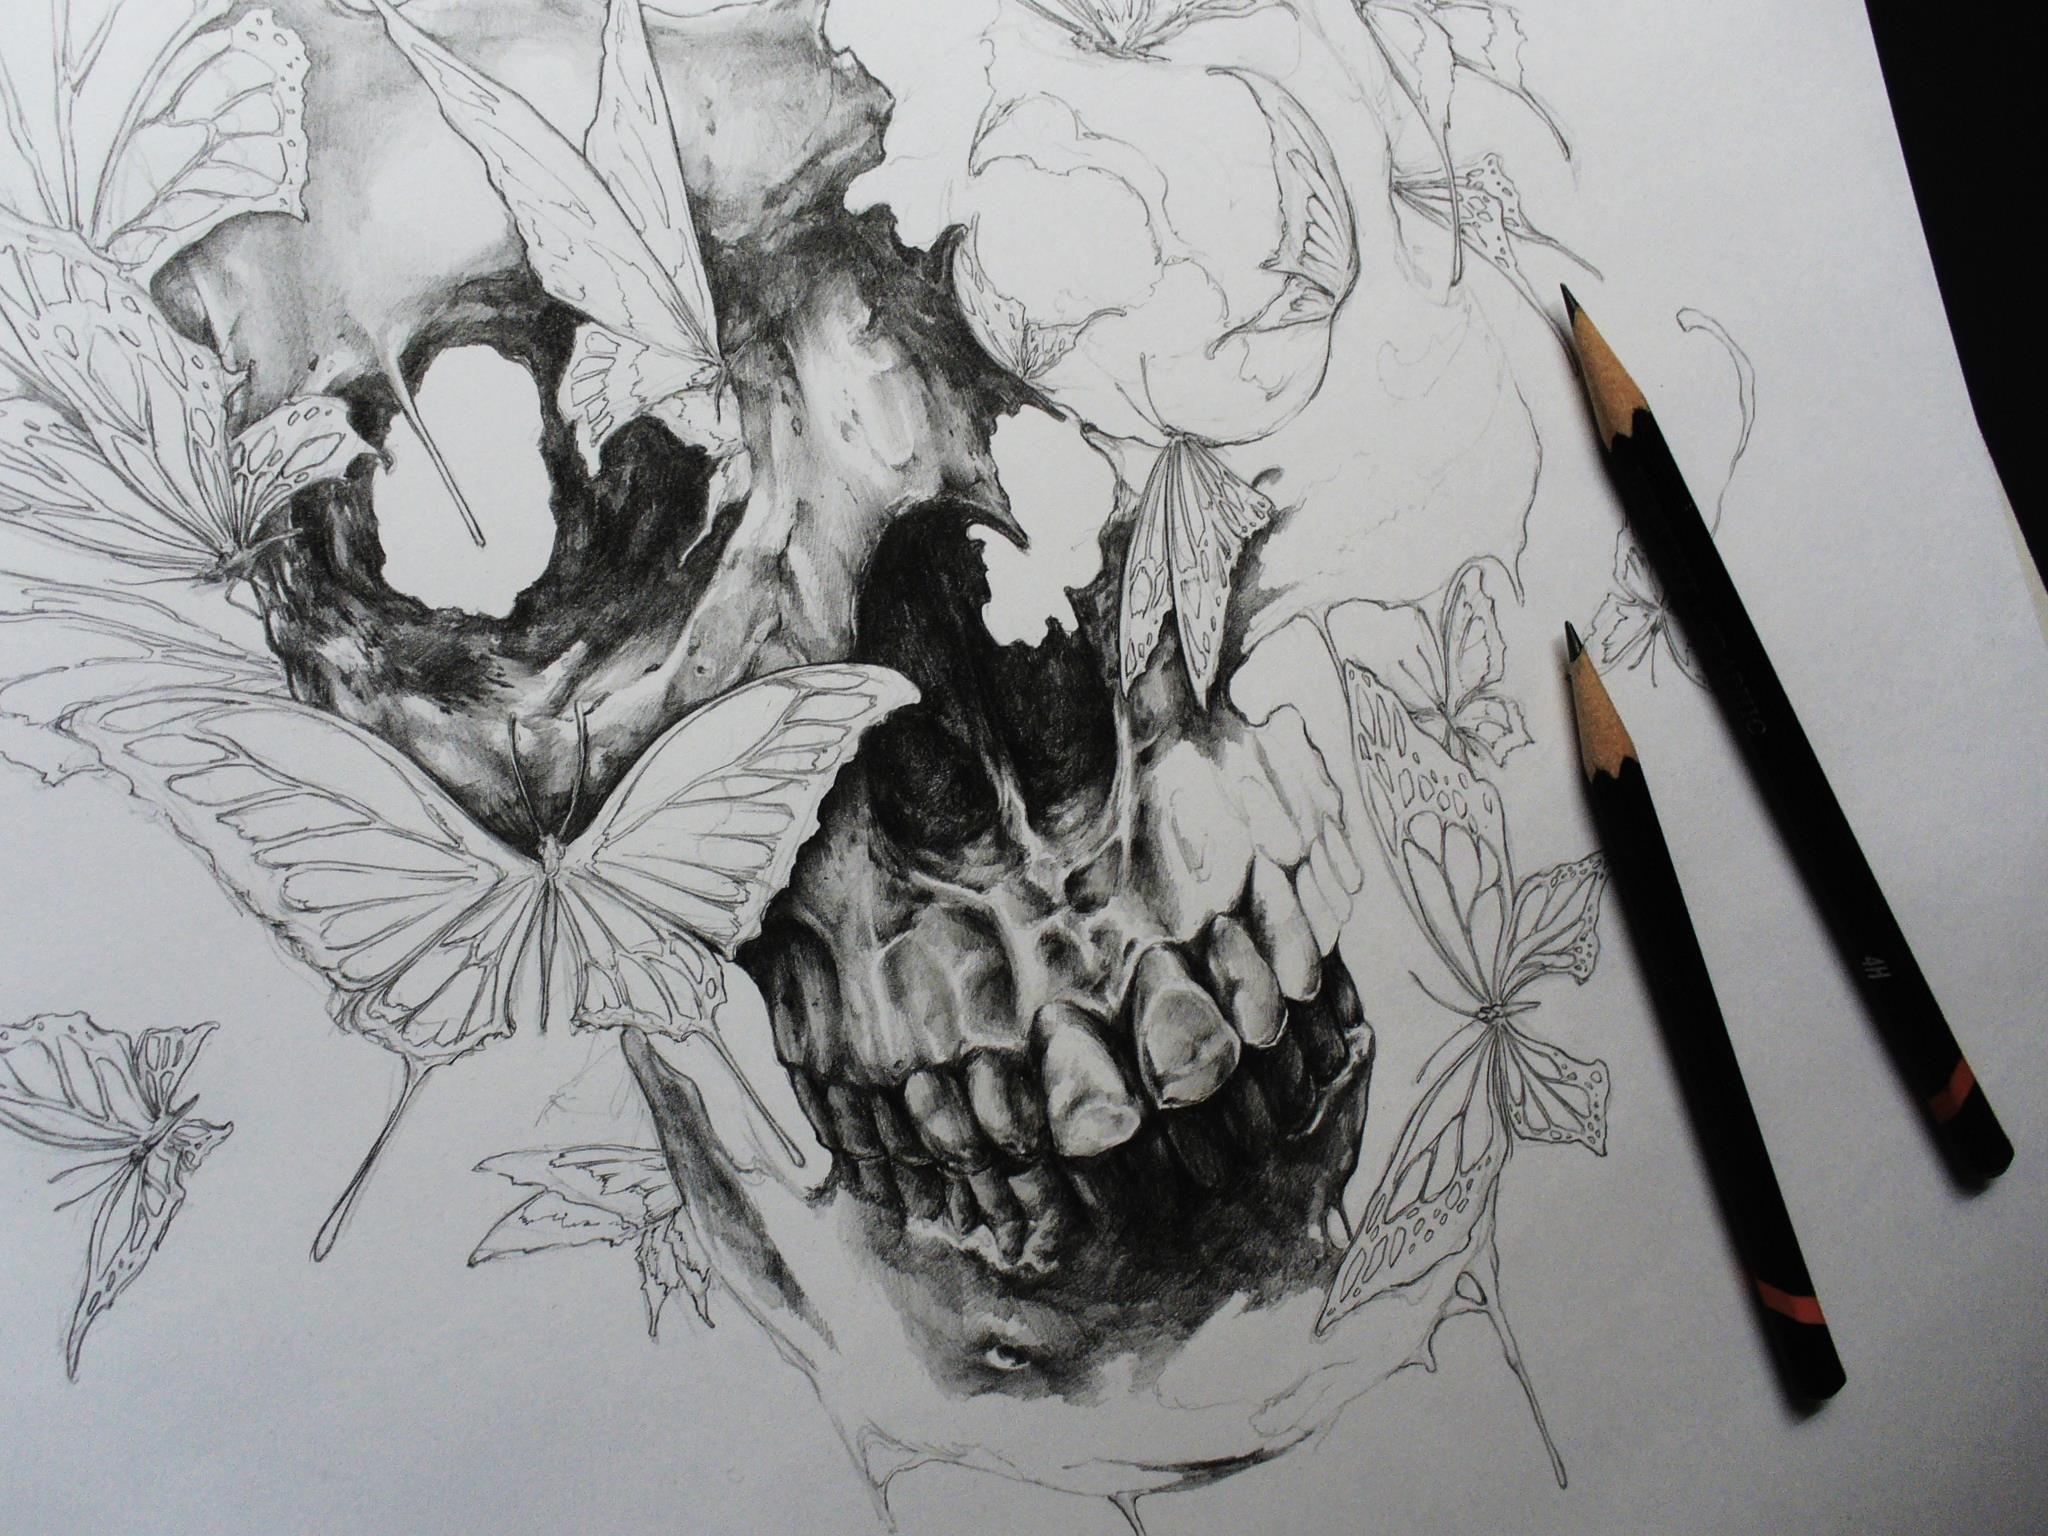 Tarin Yuangtrakul Work in Progress Art, Skulls and